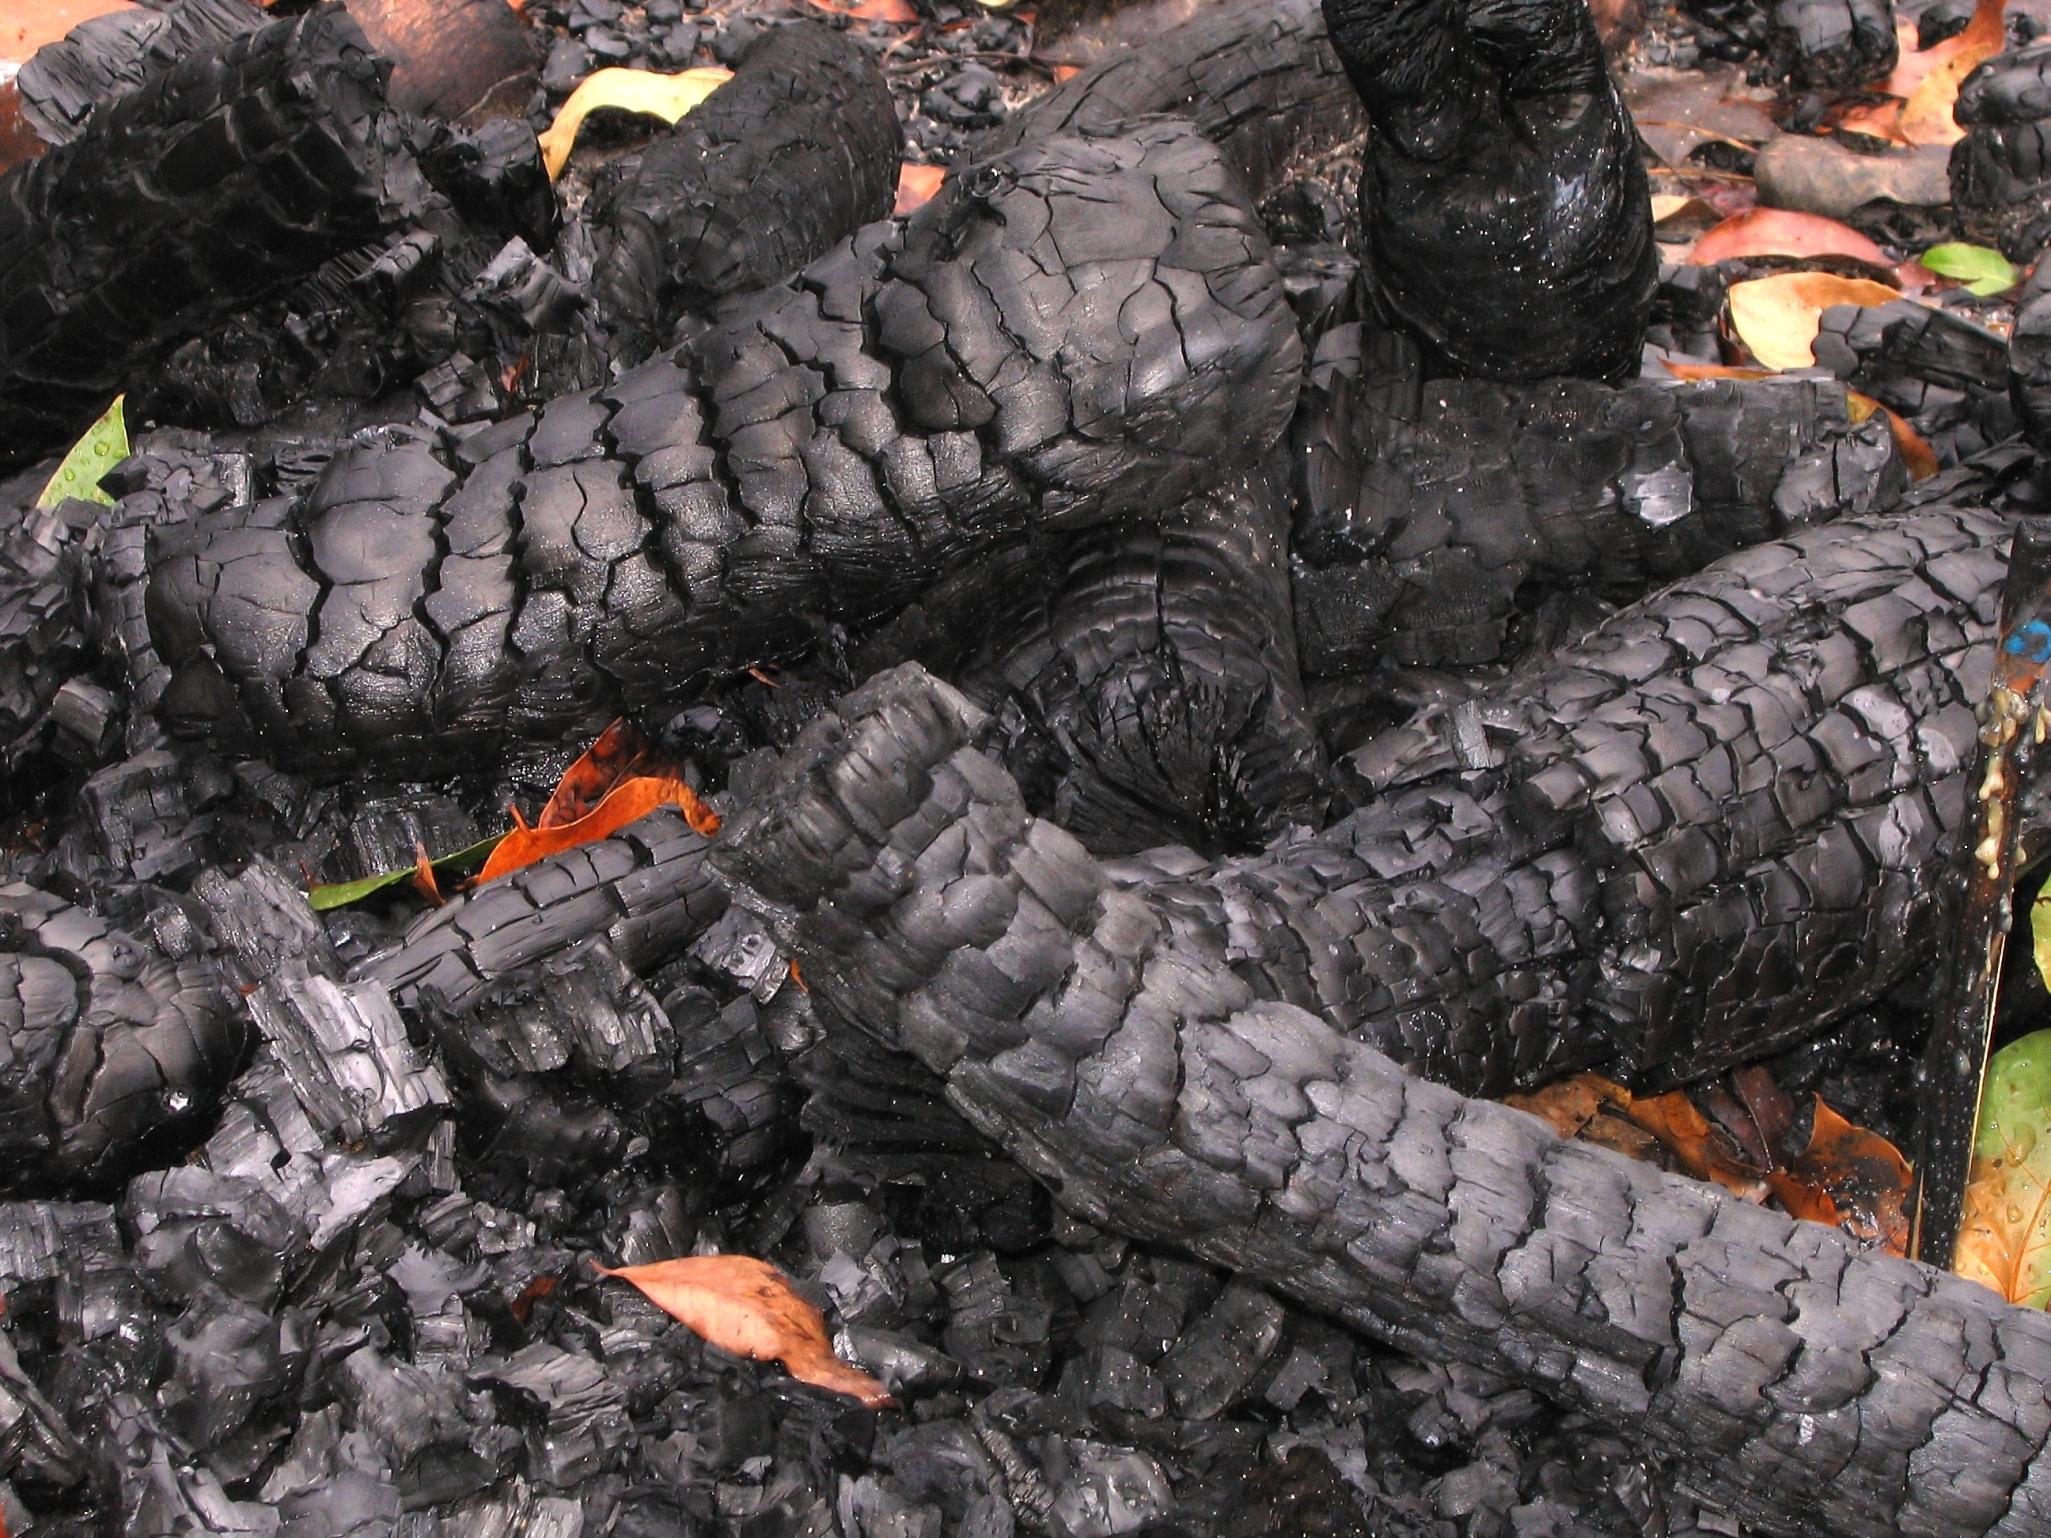 Burned Logs, Hot, Ignite, Heat, Glow, HQ Photo